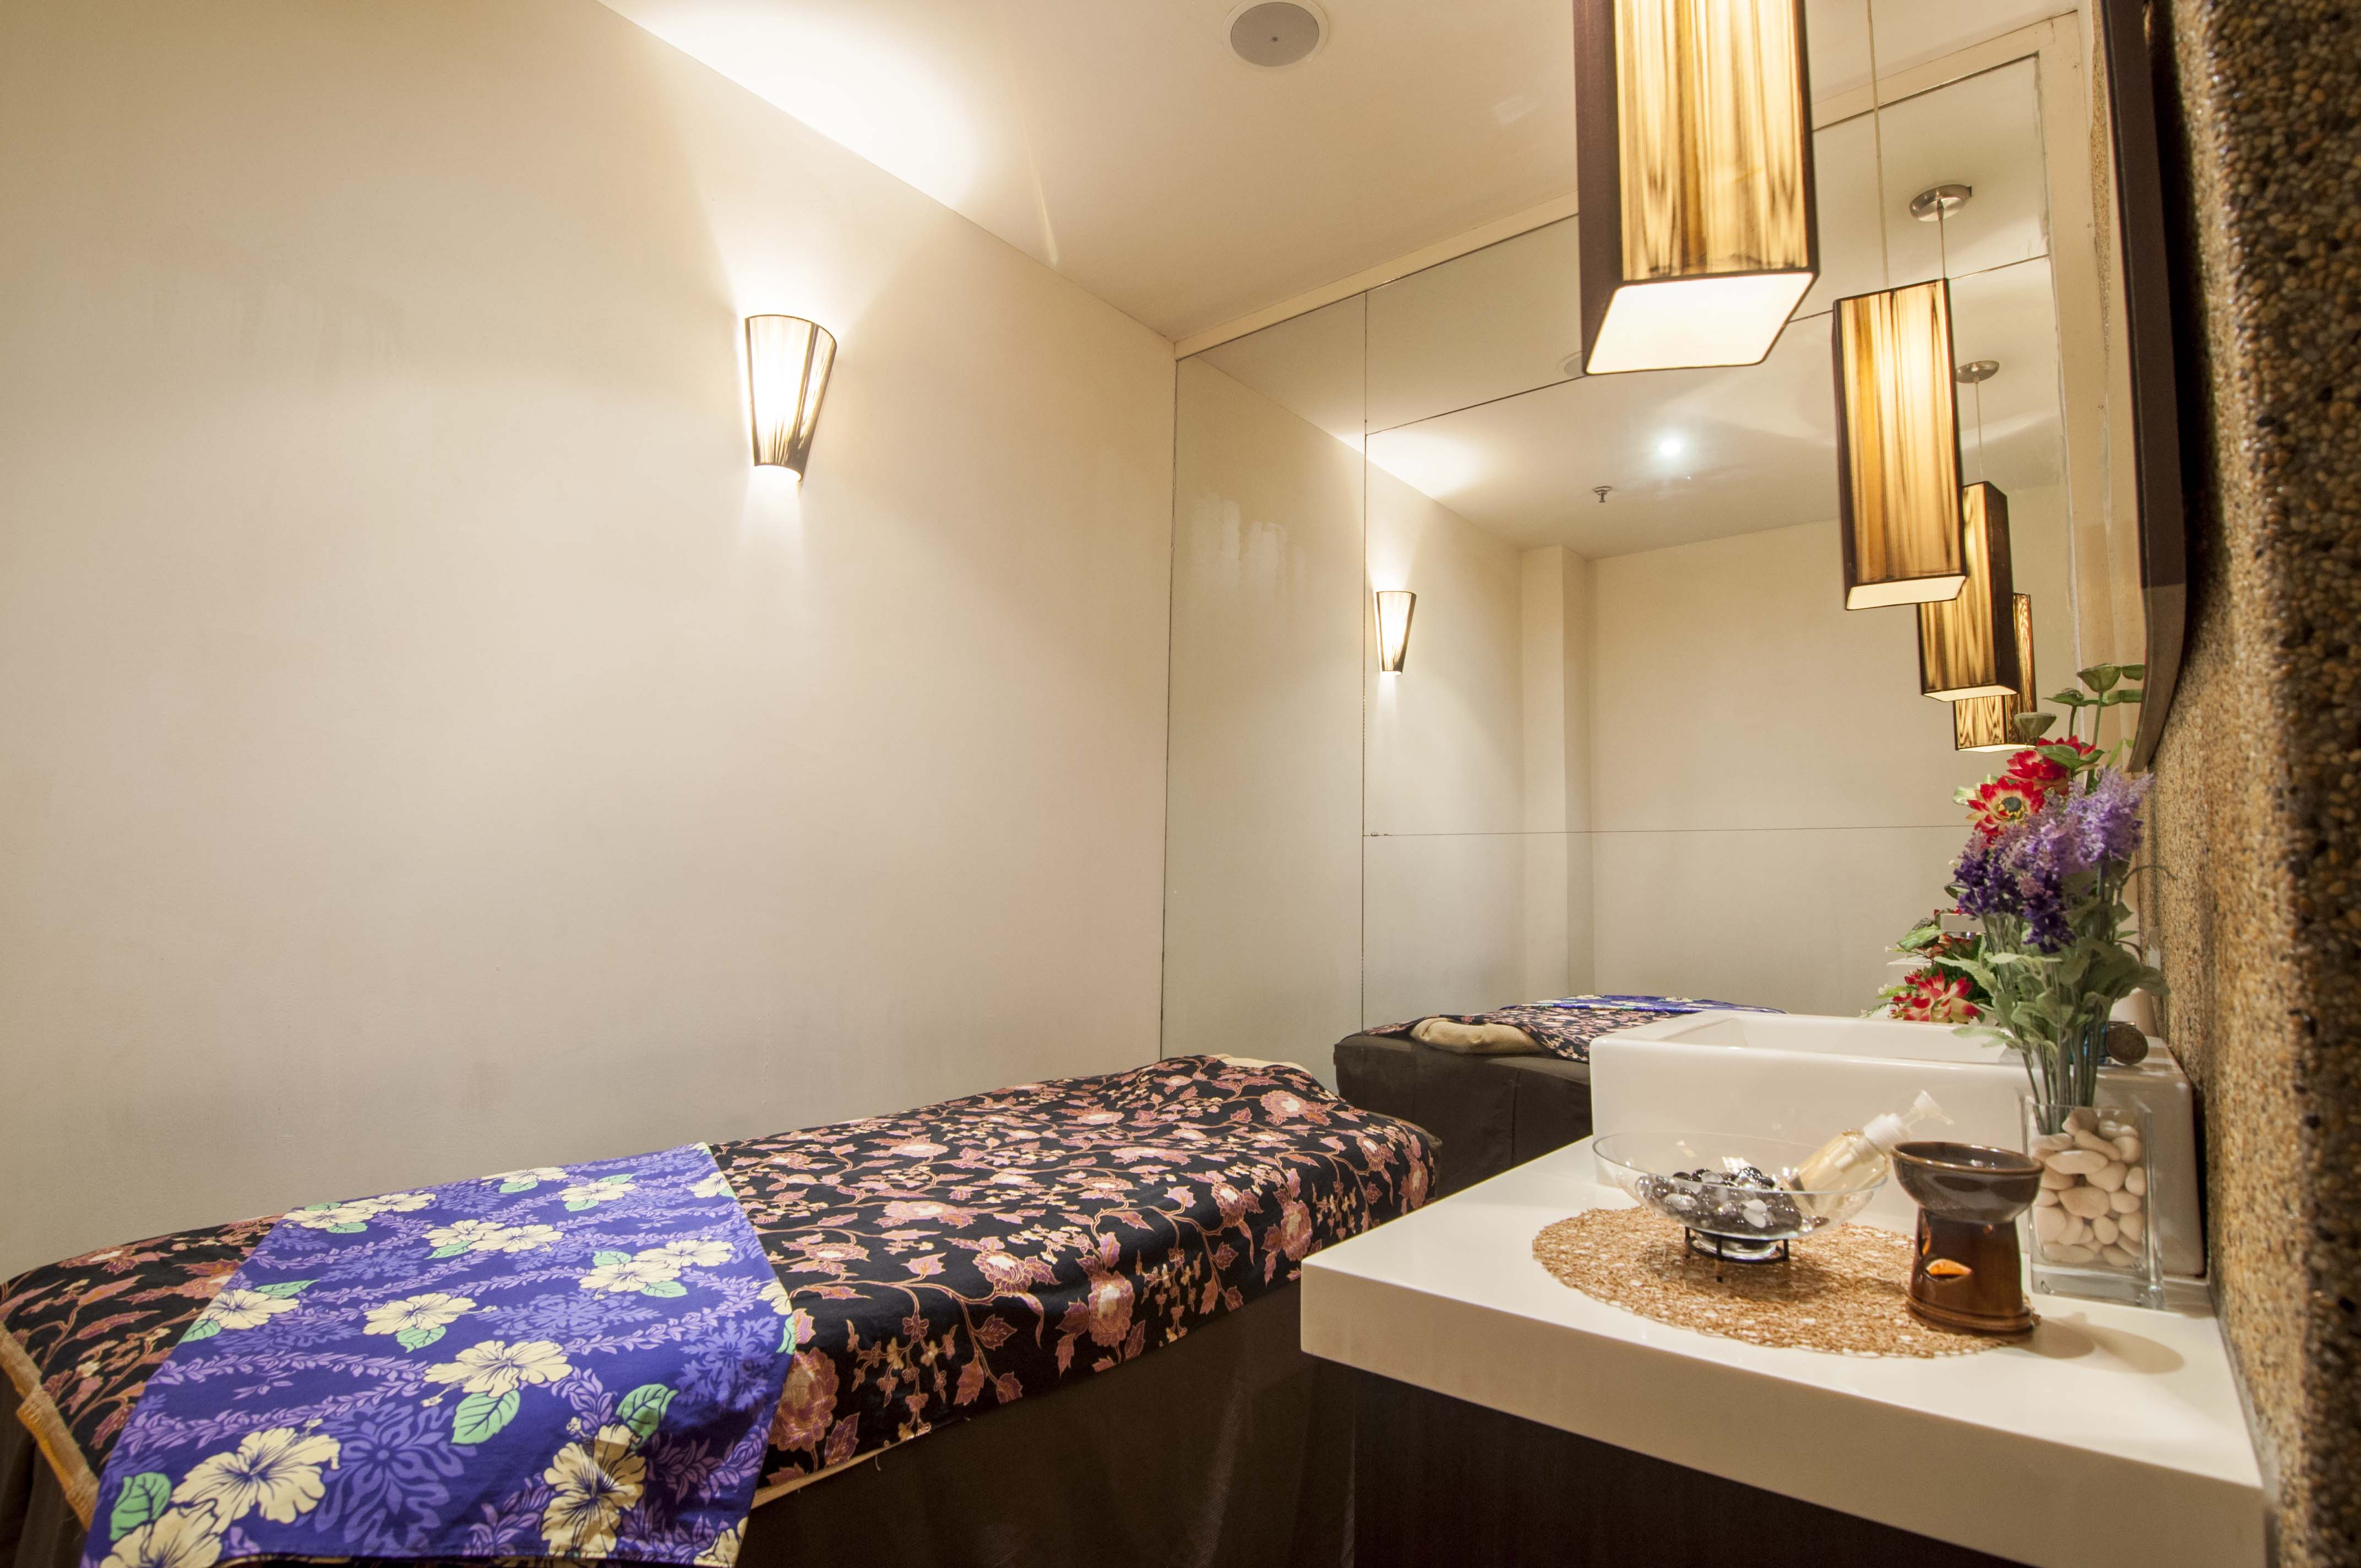 Lingam massage kl  Professional Tantric Yoni Massage For